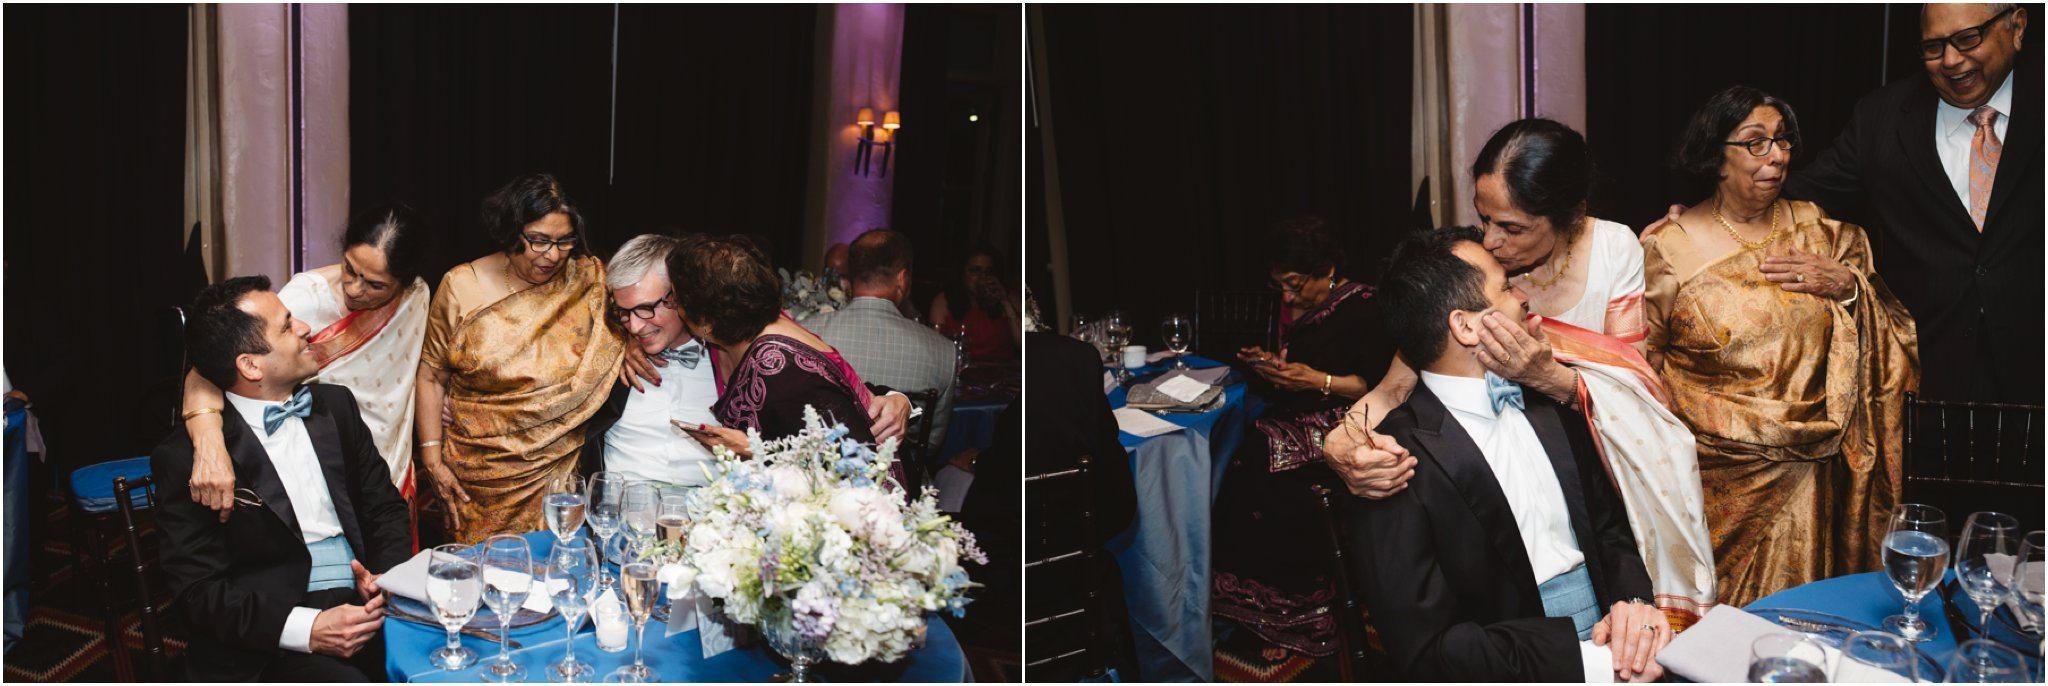 0036new-mexico-same-sex-wedding_santa-fe-wedding-photographer_albuquerque-wedding-photographer_top-photographer_-southwest-wedding-photography_-blue-rose-studio